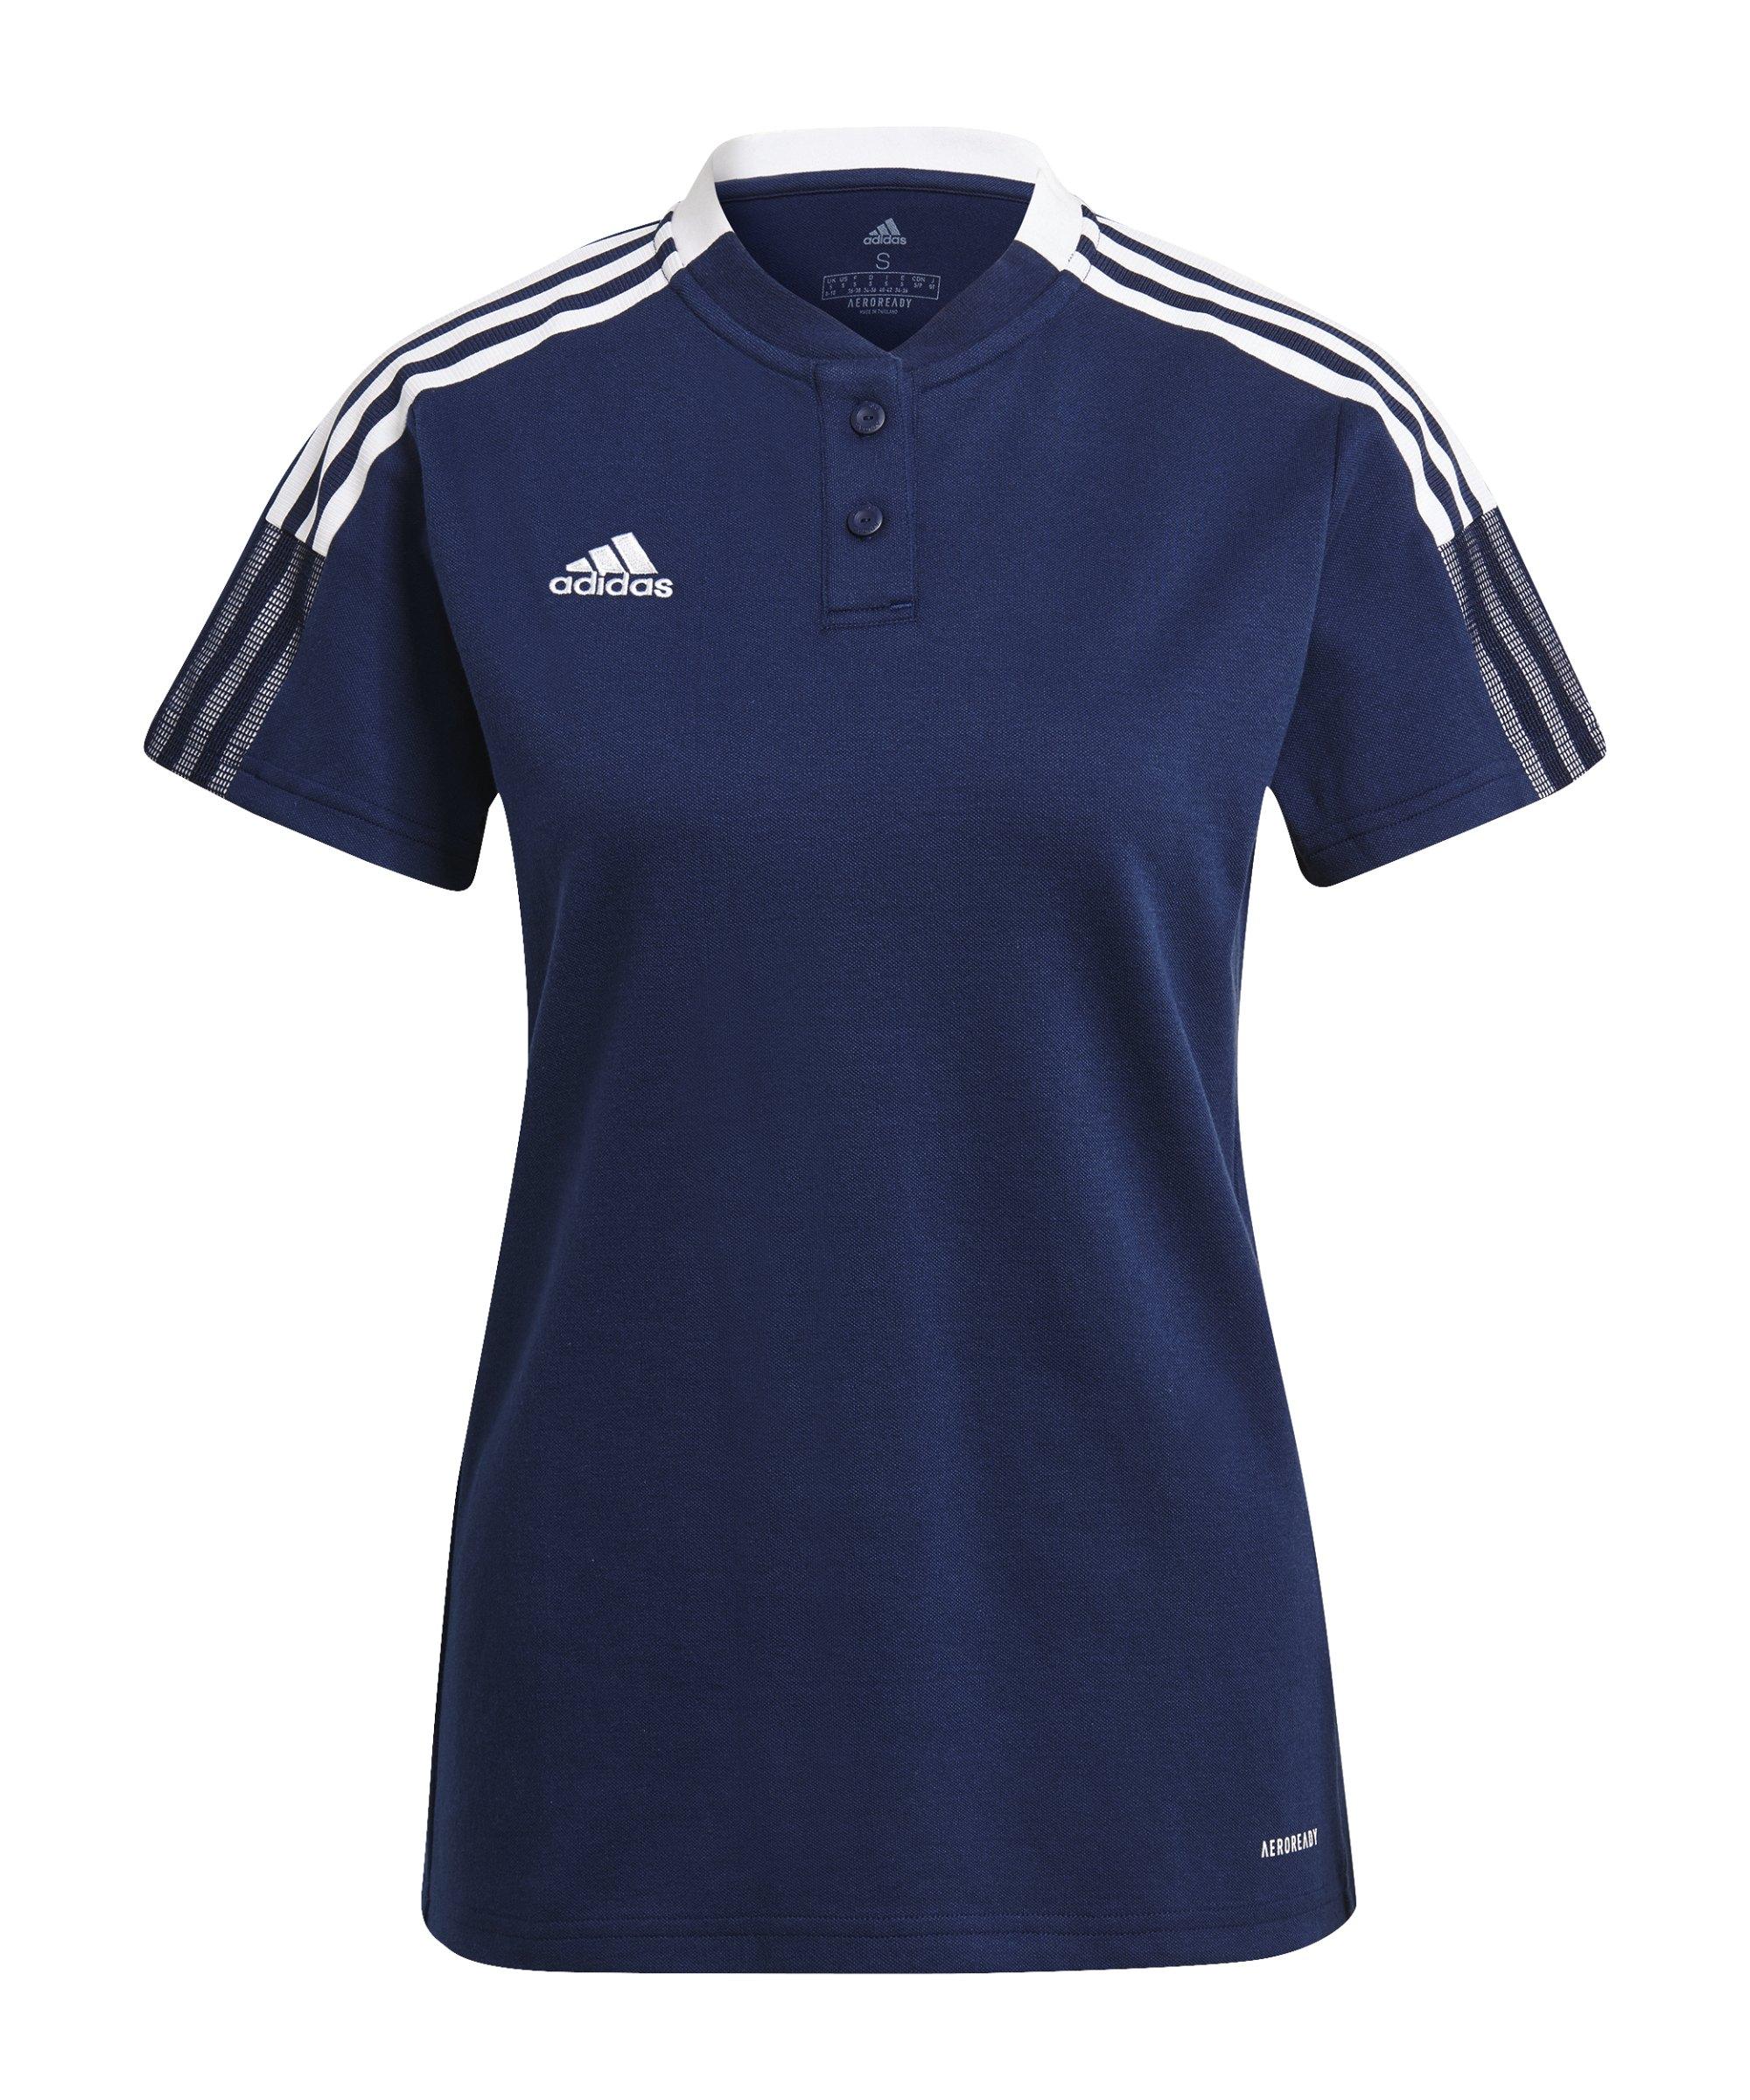 adidas Tiro 21 Poloshirt Damen Dunkelblau - blau